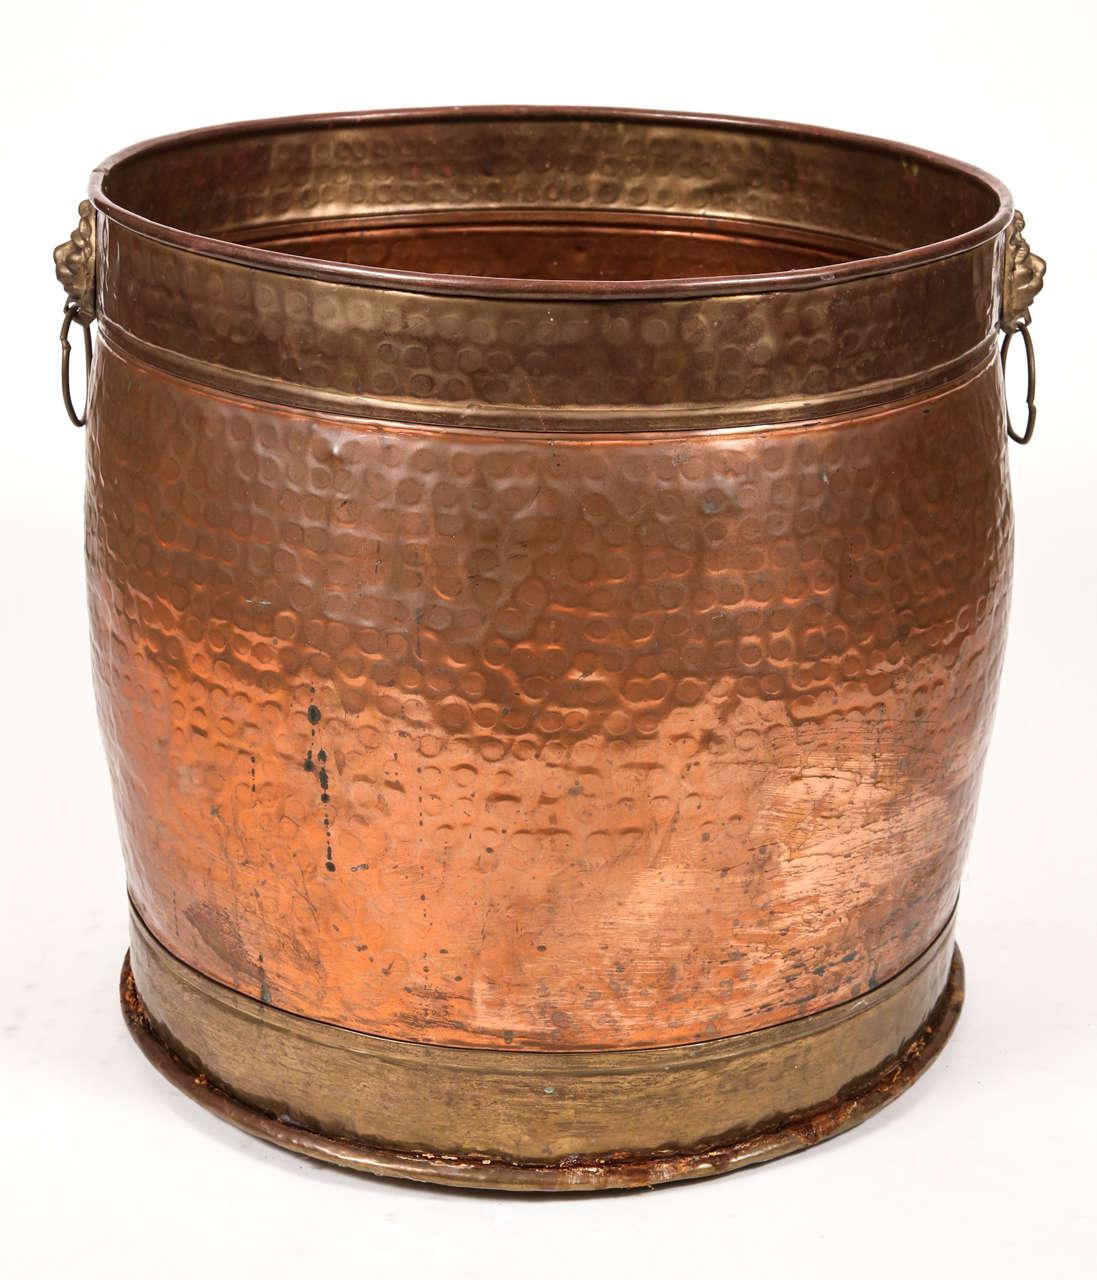 Hammered Copper Pot 2